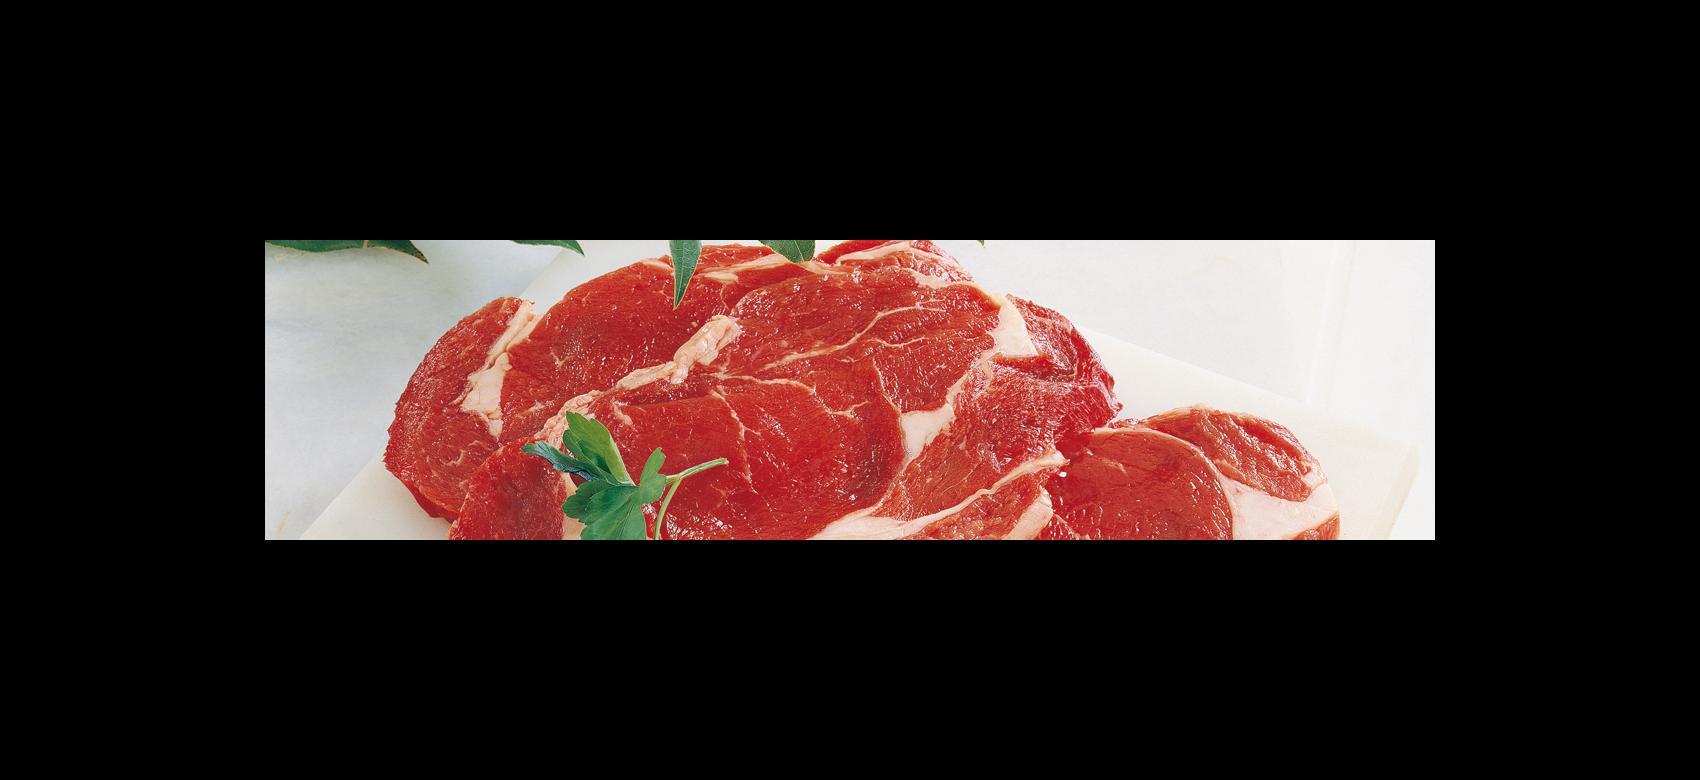 Imagen de un corte de carne